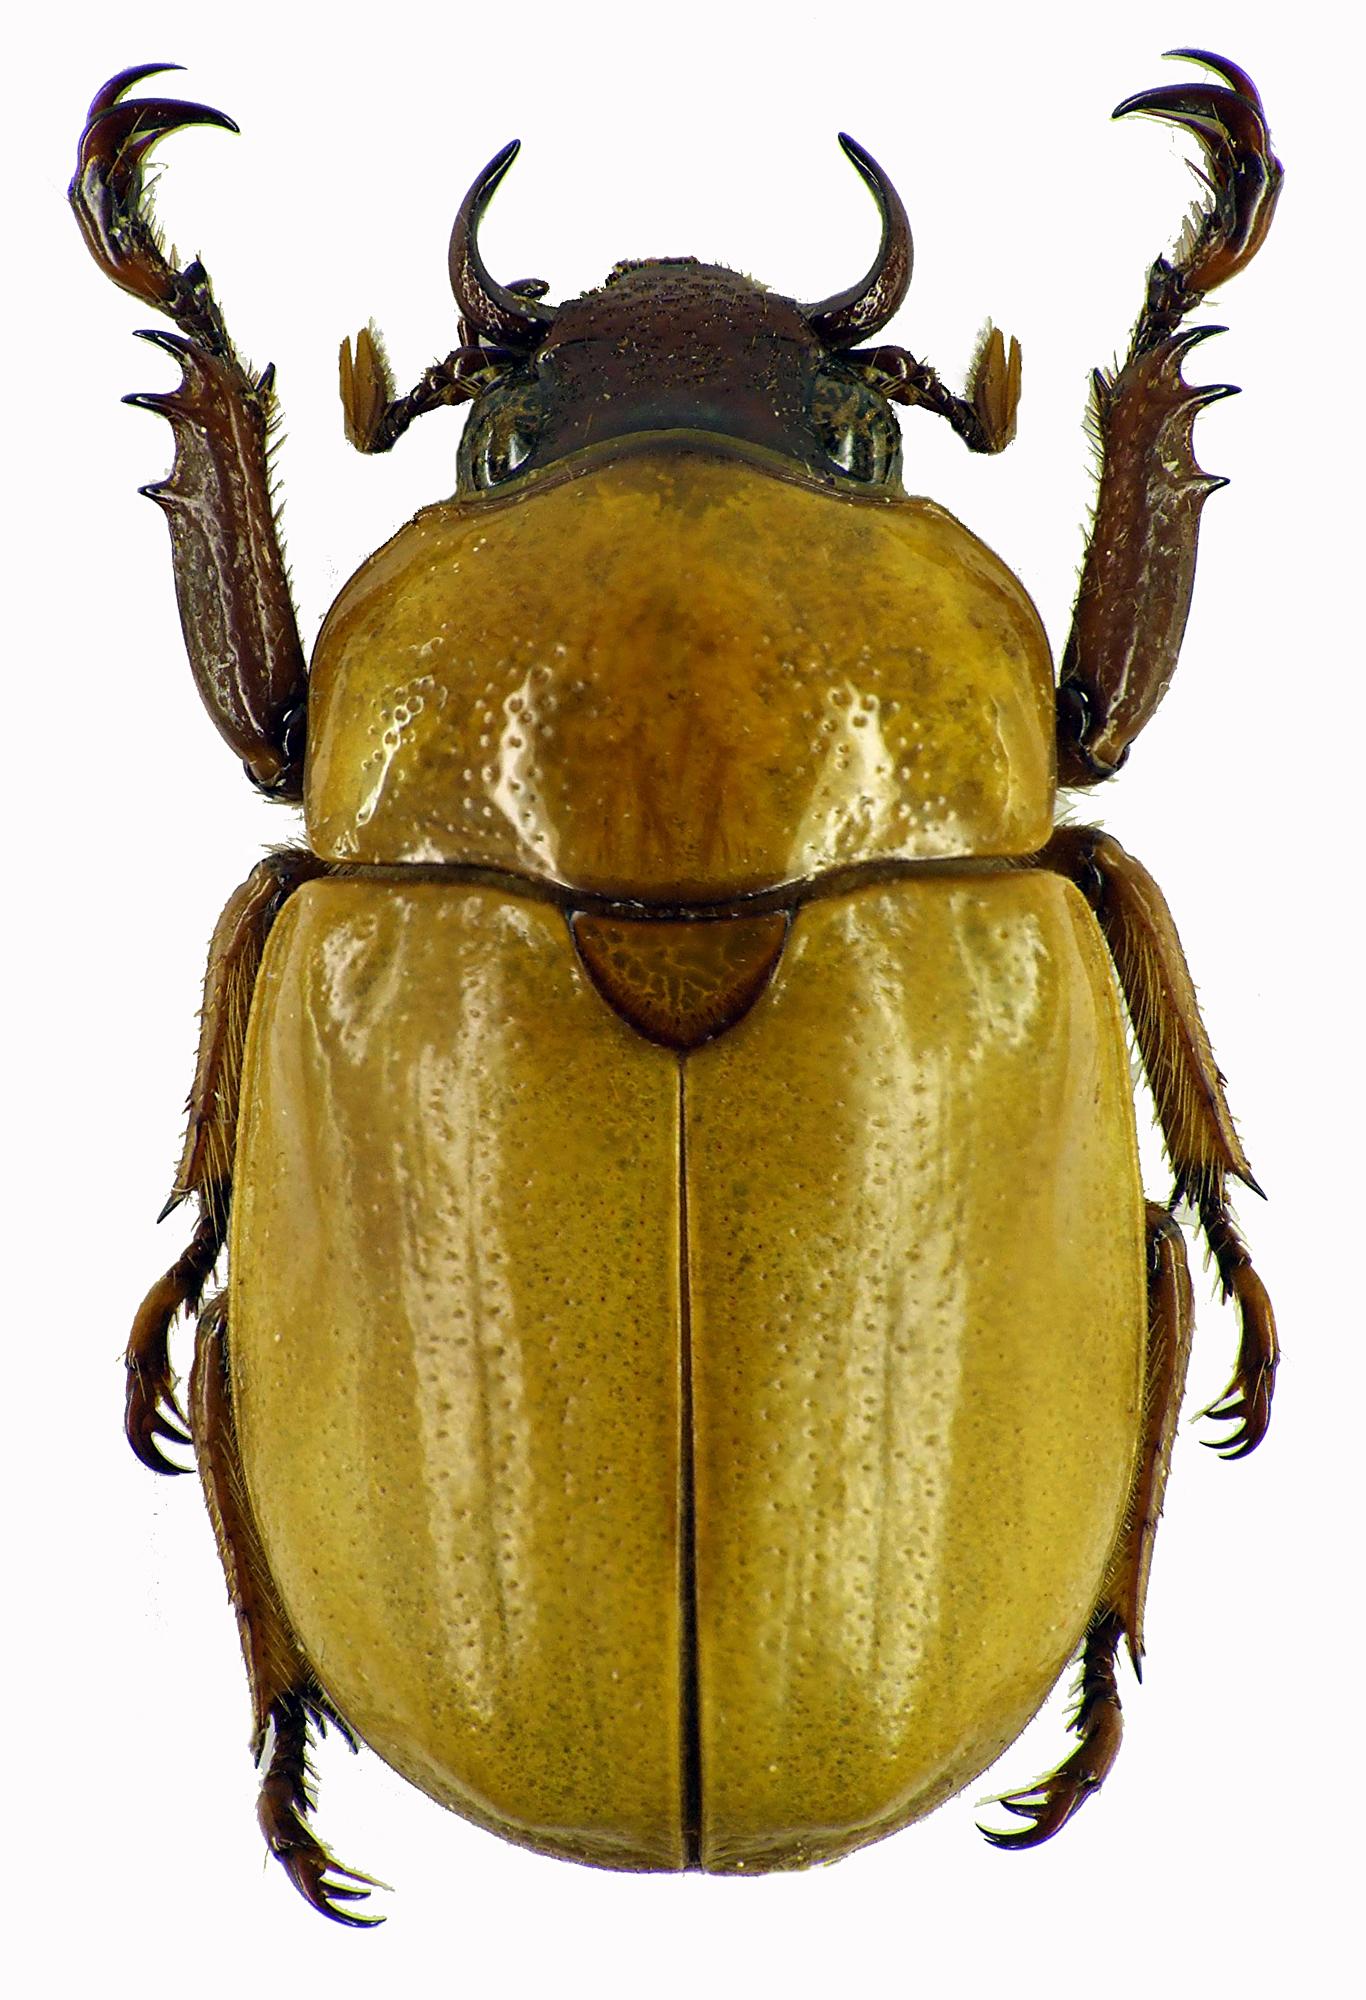 Kinagoganea kinabaluensis 28357cz61.jpg